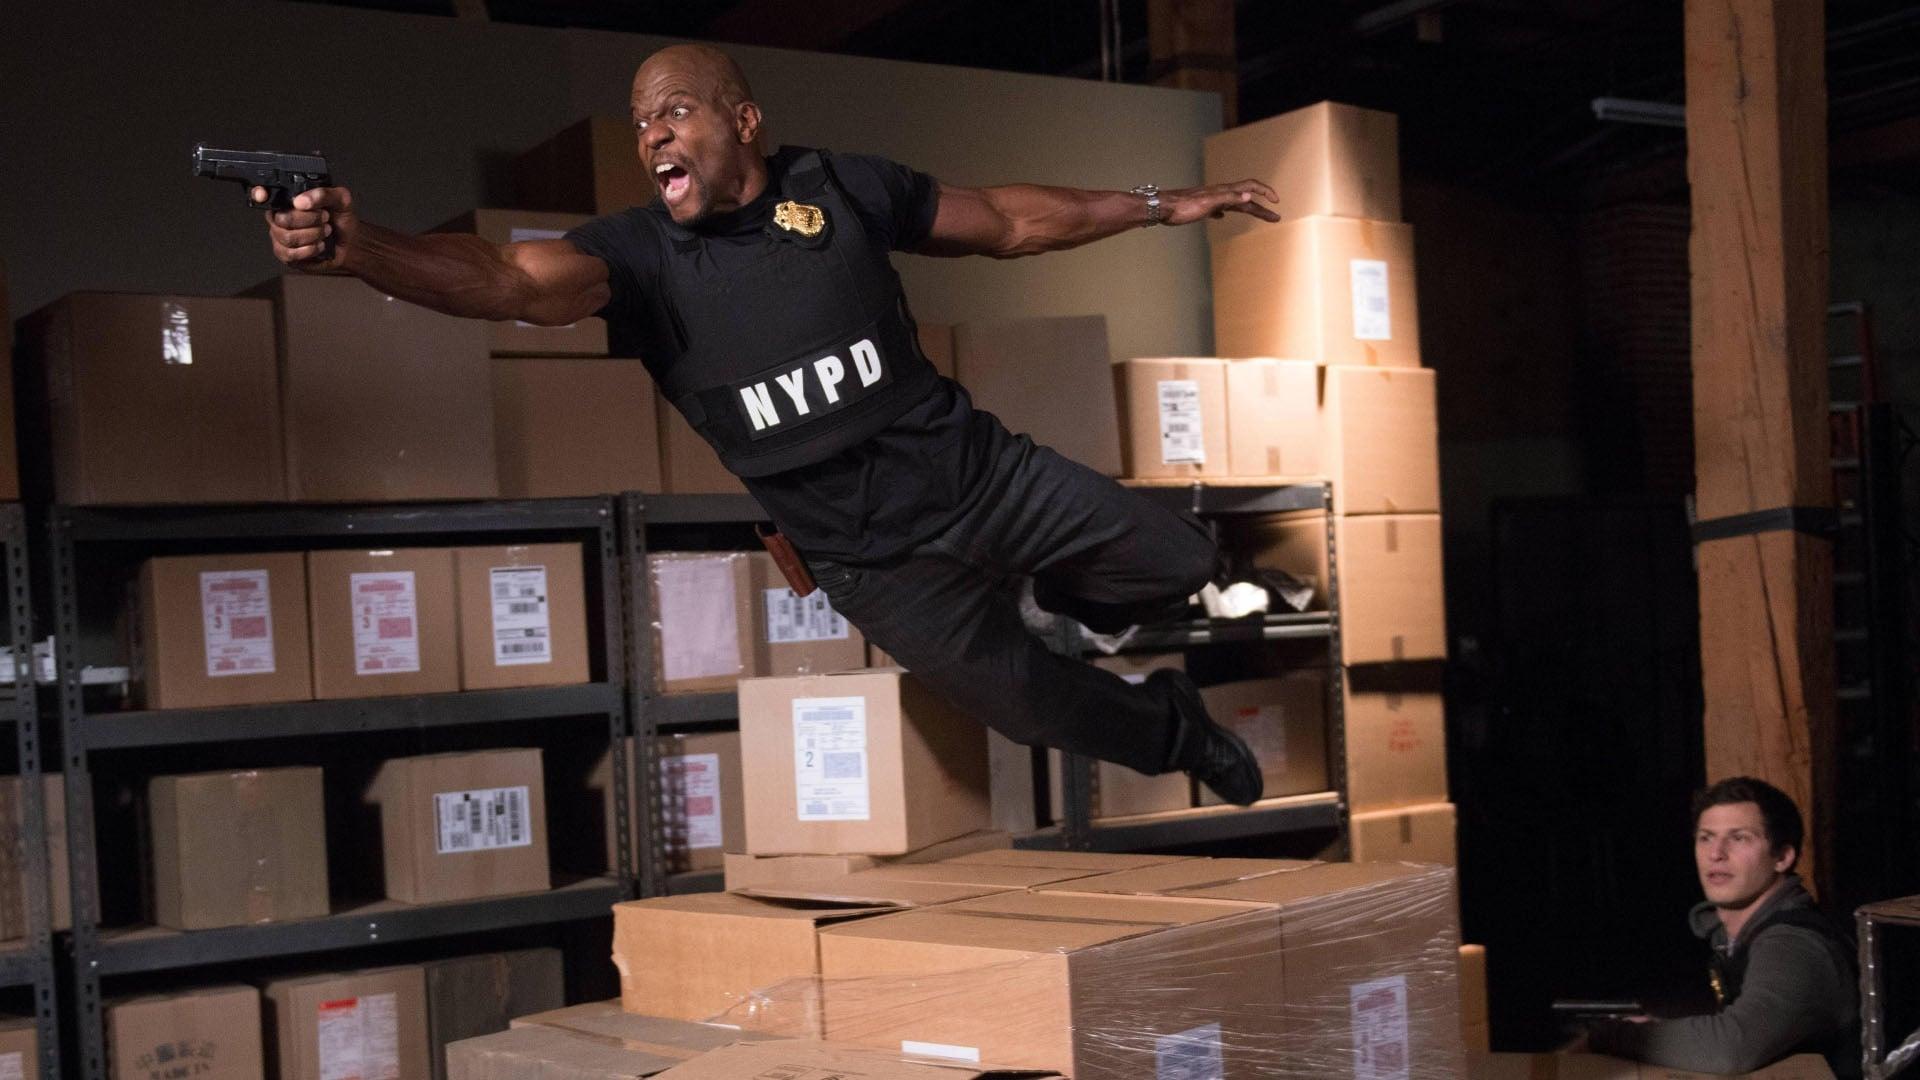 Brooklyn Nine-Nine - Season 1 Episode 14 : The Ebony Falcon